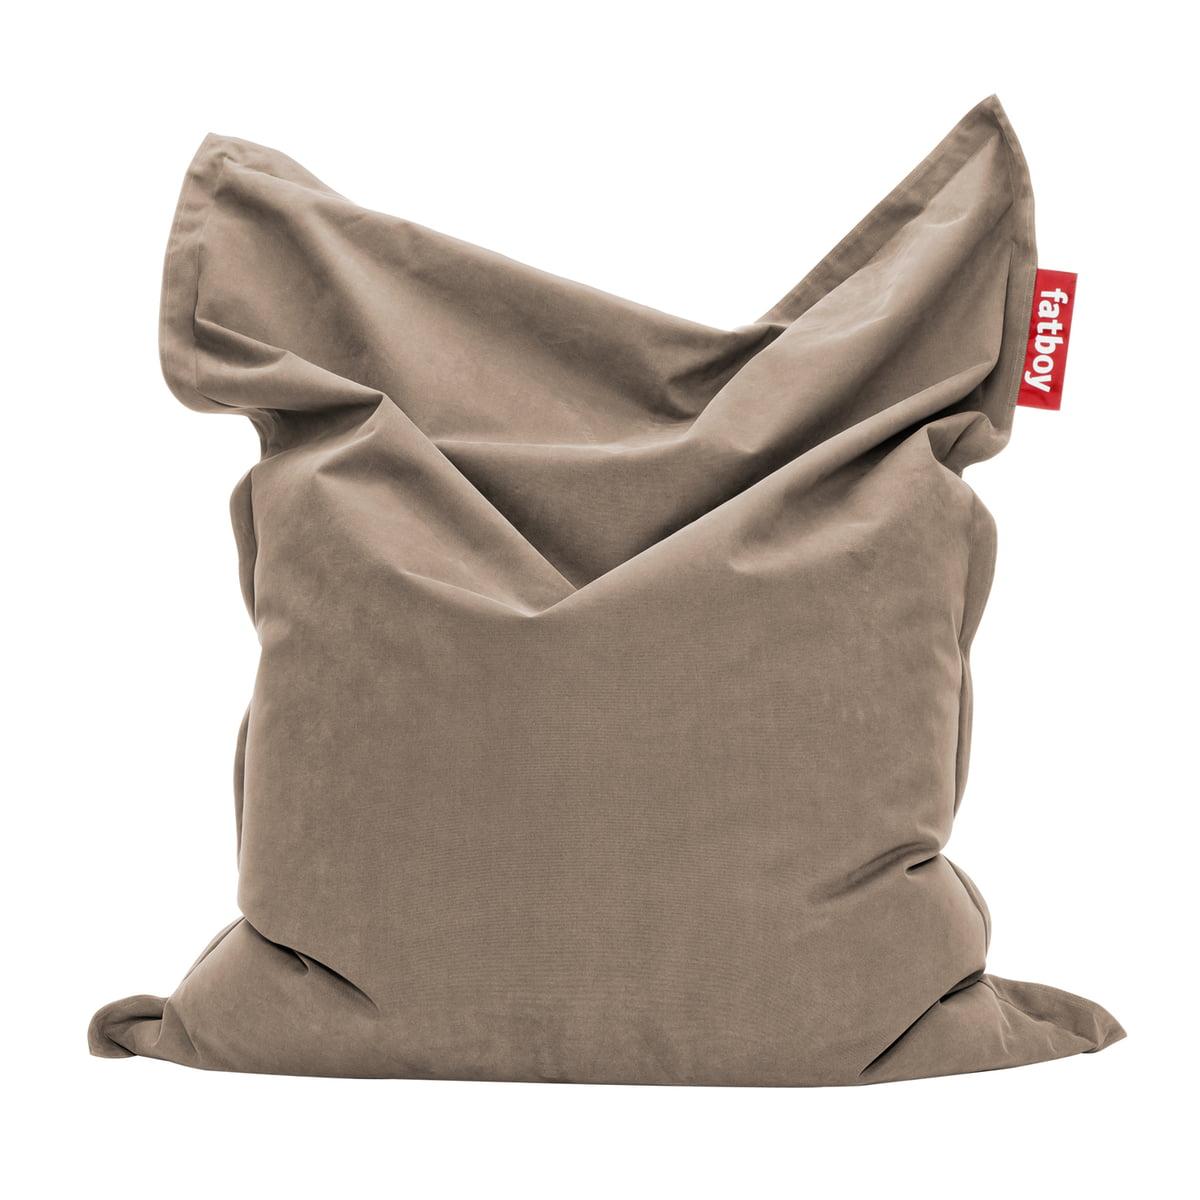 Fatboy - Original Sitzsack Stonewashed, sand | Wohnzimmer > Sessel > Sitzsaecke | Sand | Baumwolle| polystyrol | Fatboy